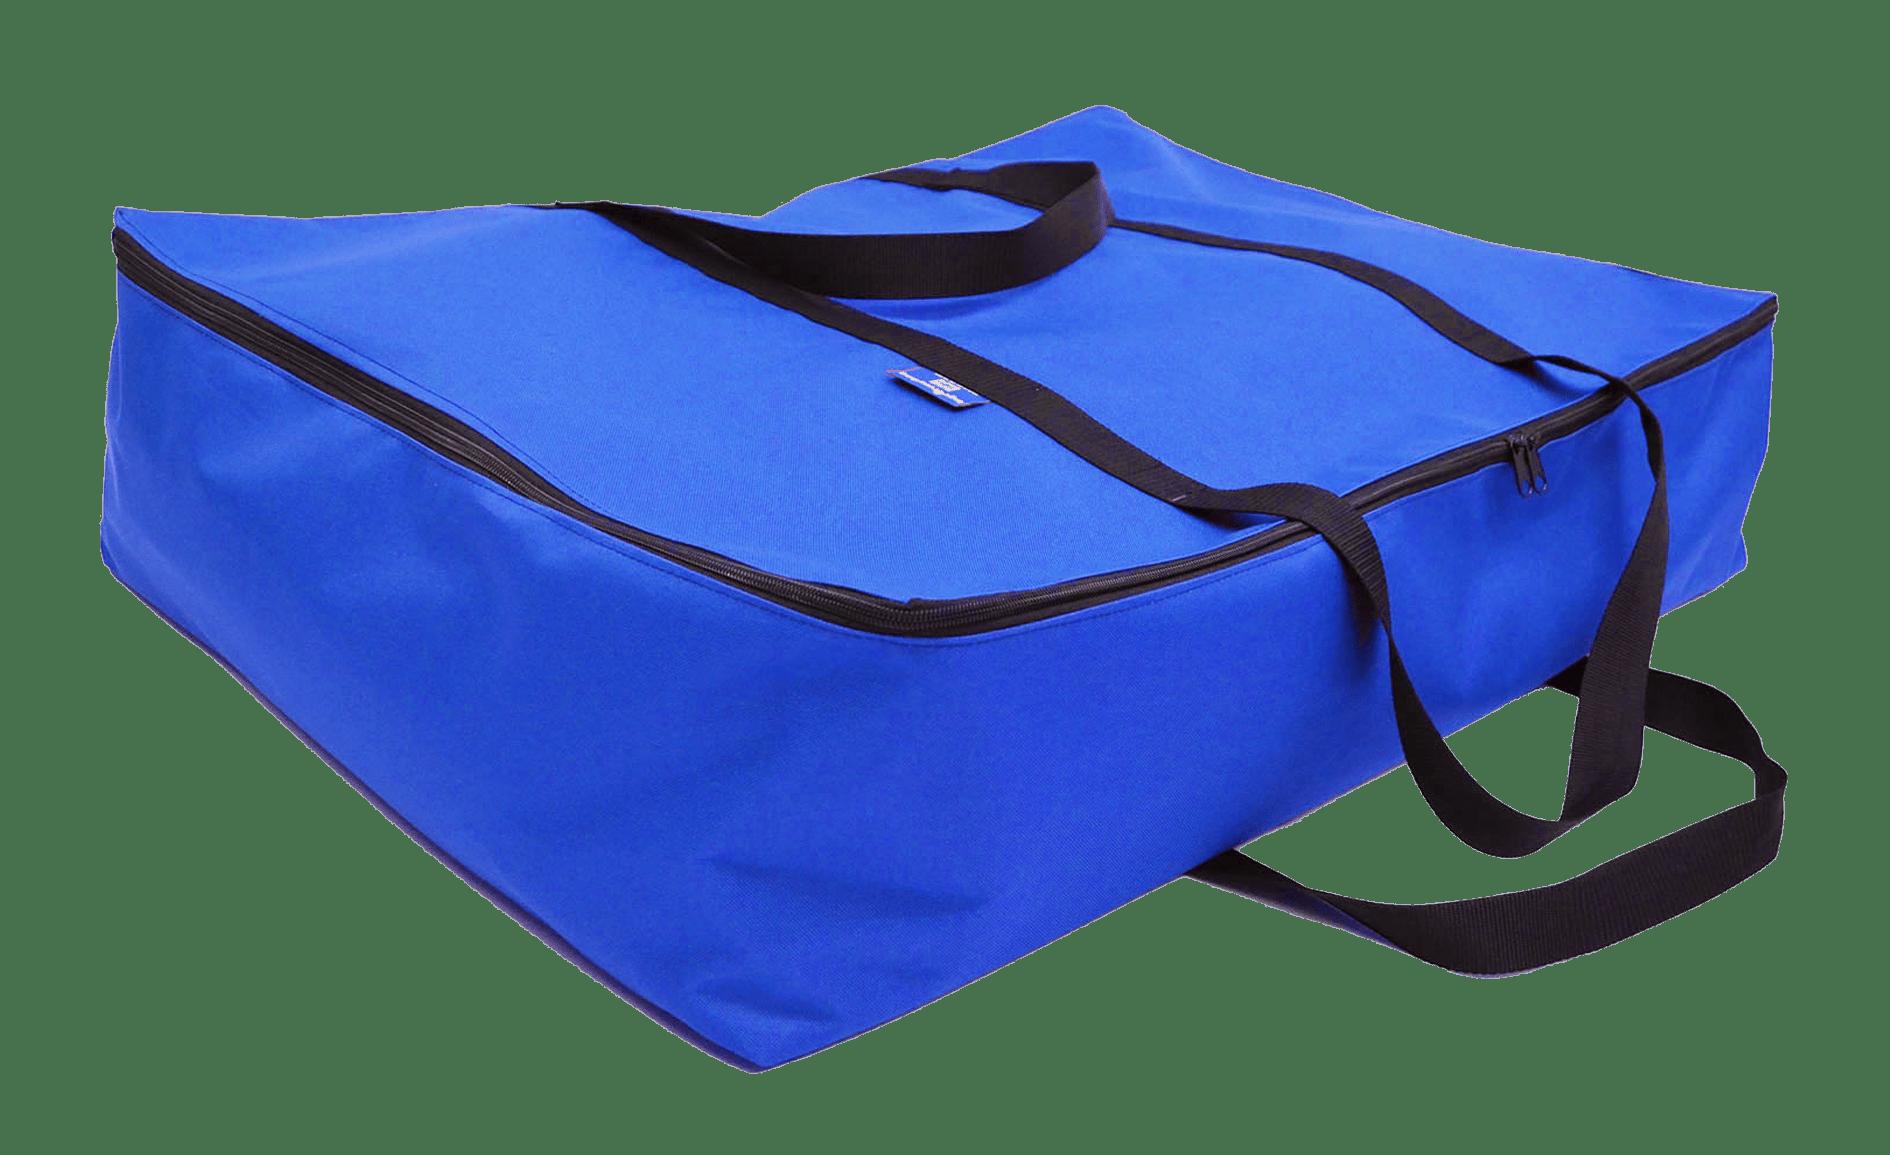 Bike Bag Cover Waterproof With Zip And Handles